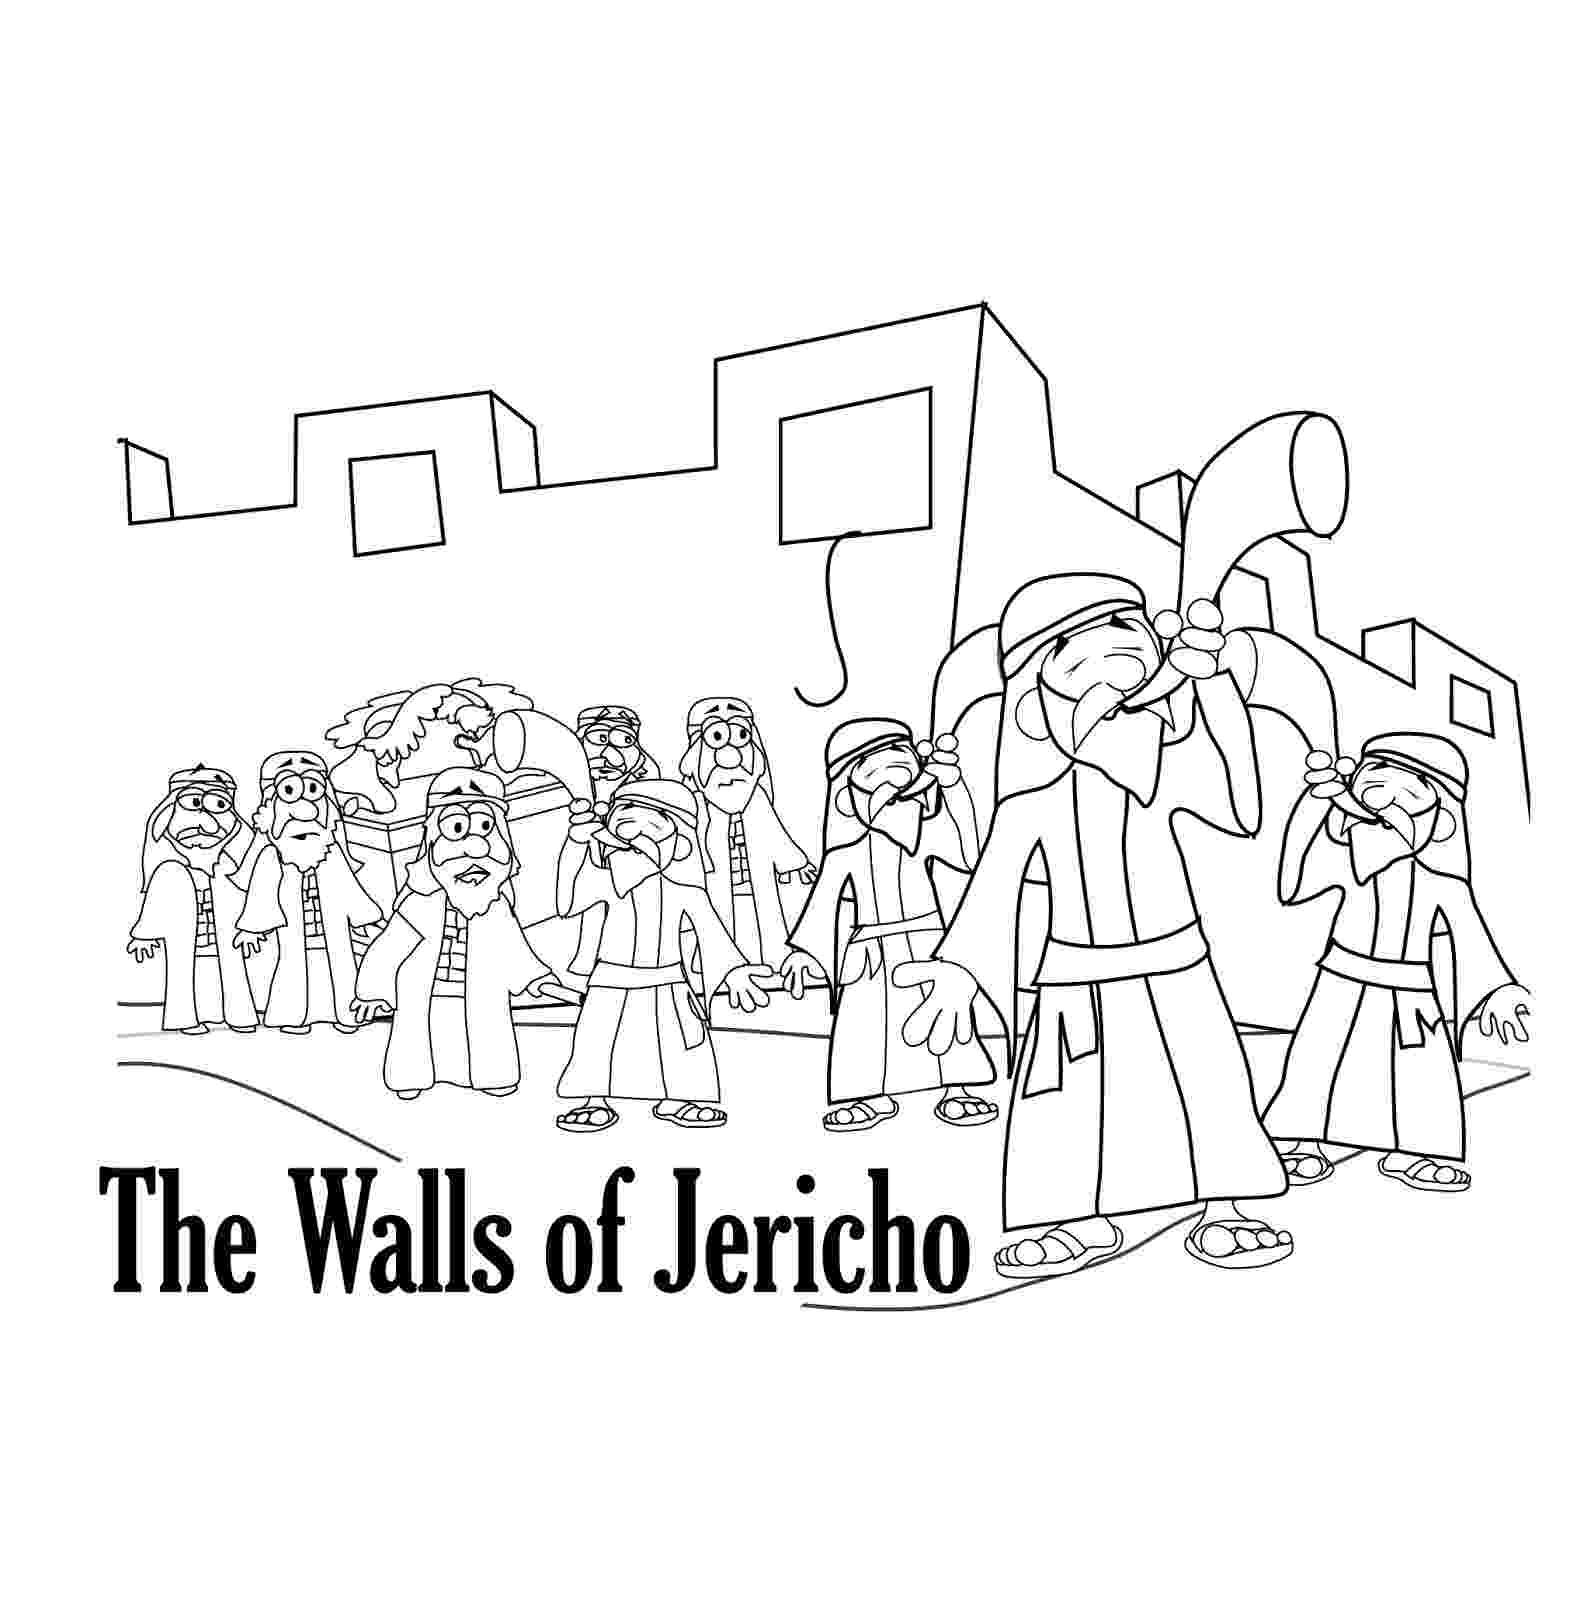 battle of jericho coloring page bible joshua jericho on pinterest bible coloring jericho page of coloring battle